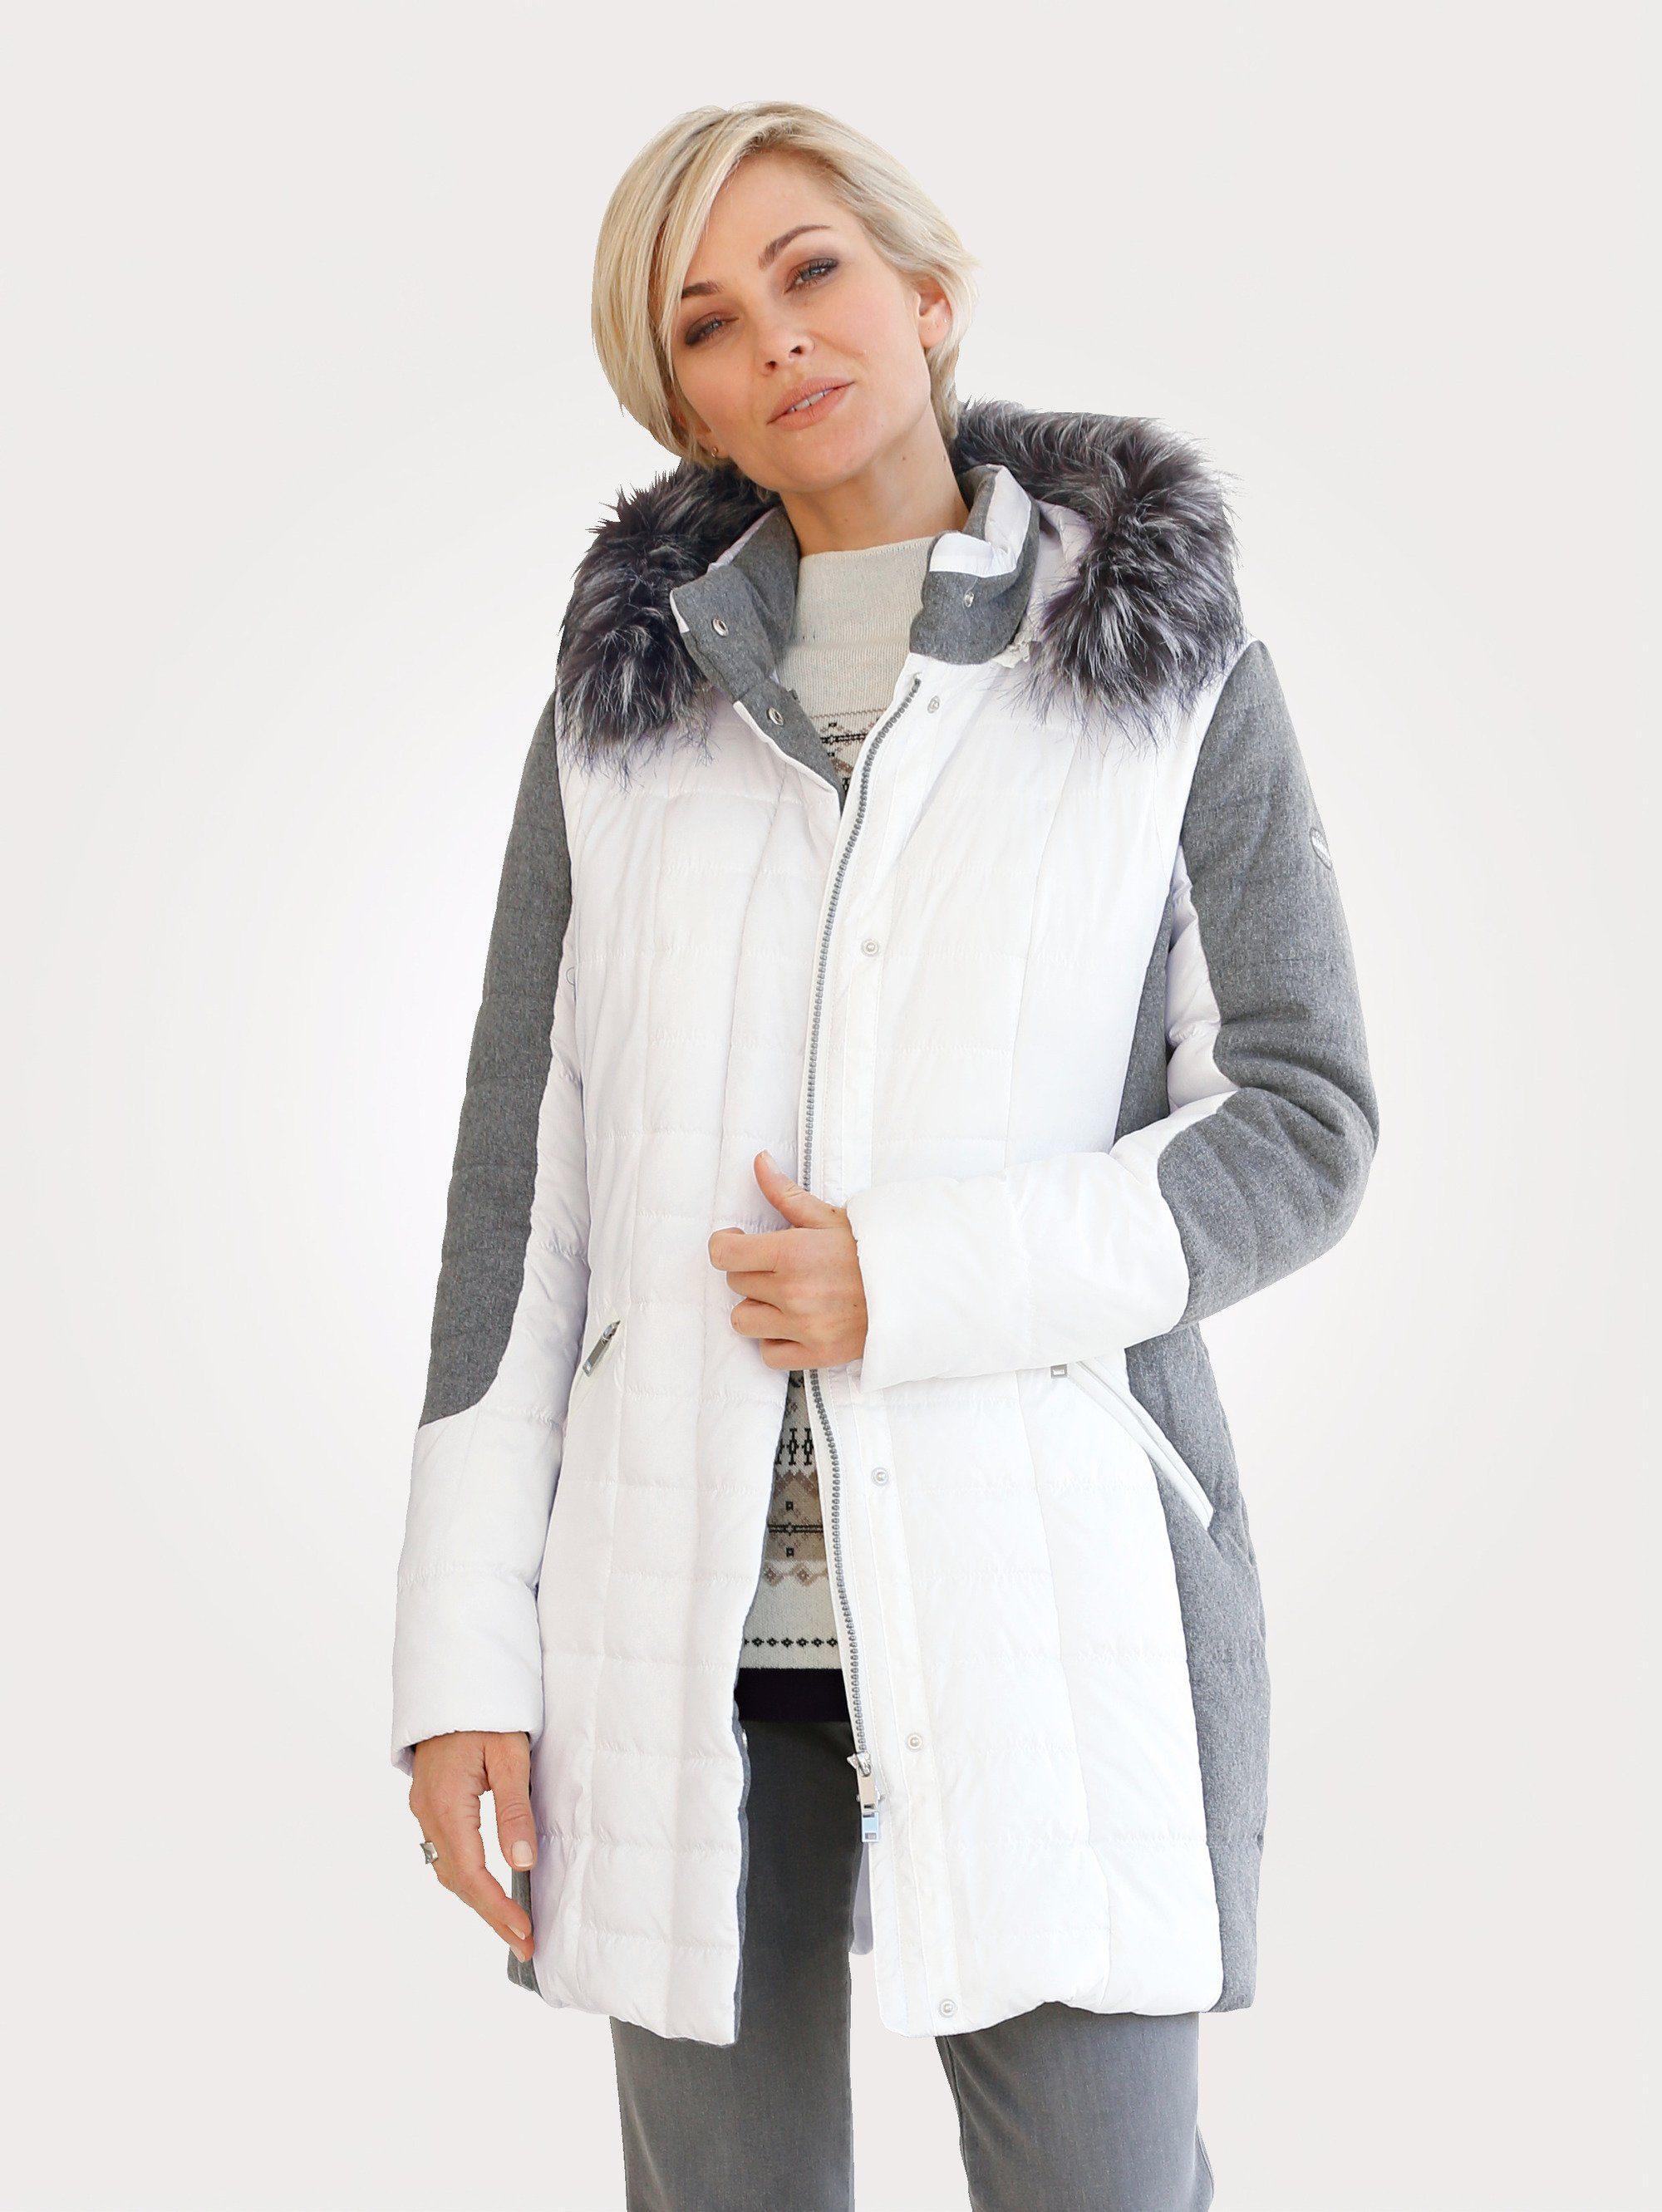 Mona Steppjacke mit abnehmbarer Kapuze | Bekleidung > Jacken > Daunenjacken & Steppjacken | Weiß | Polyester - Polyacryl | Mona